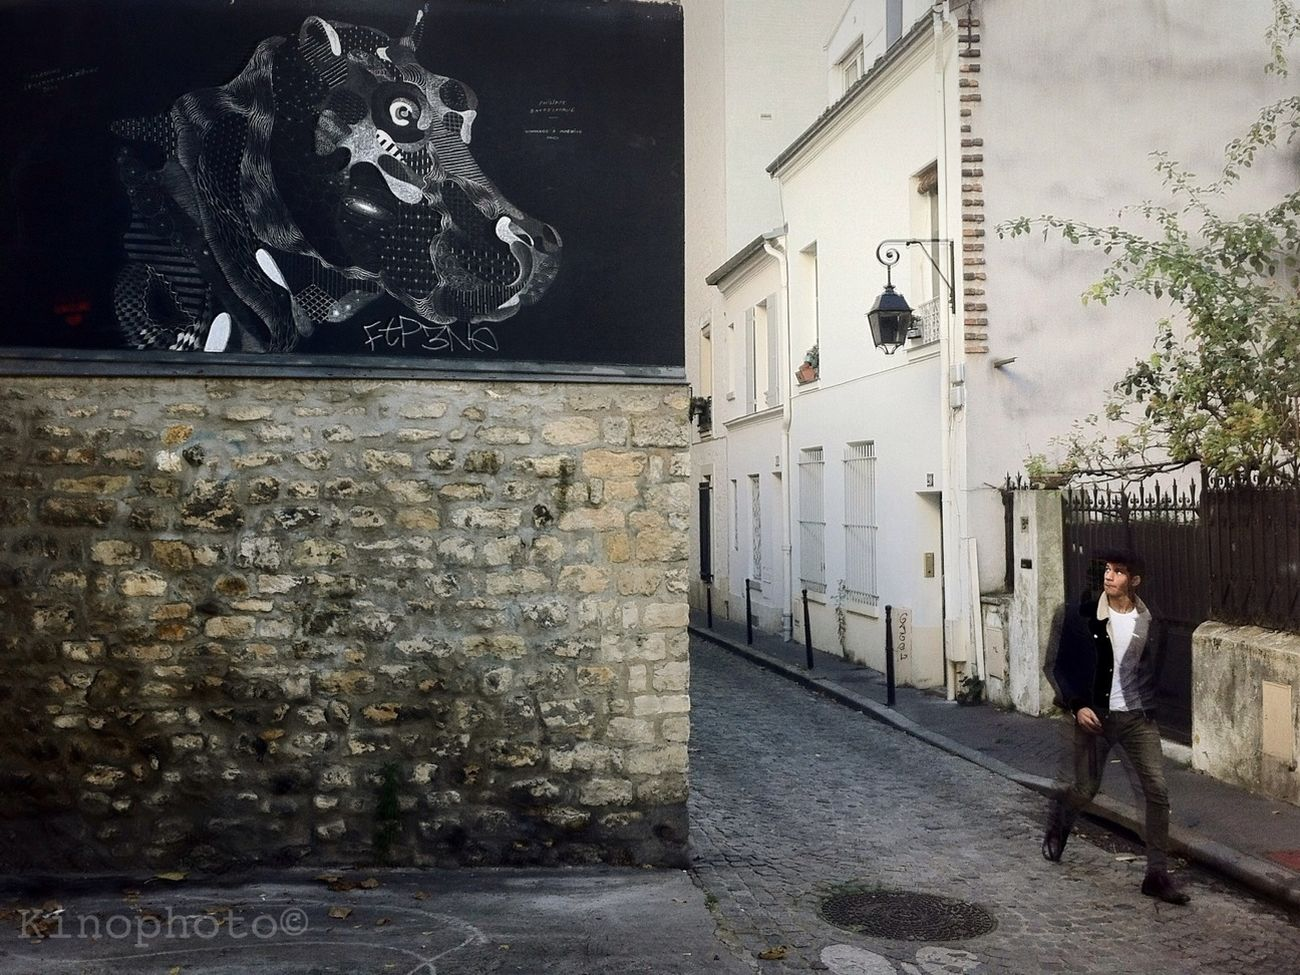 Un échange de regards. Paris Streetart Streetphoto_color Street Art/Graffiti